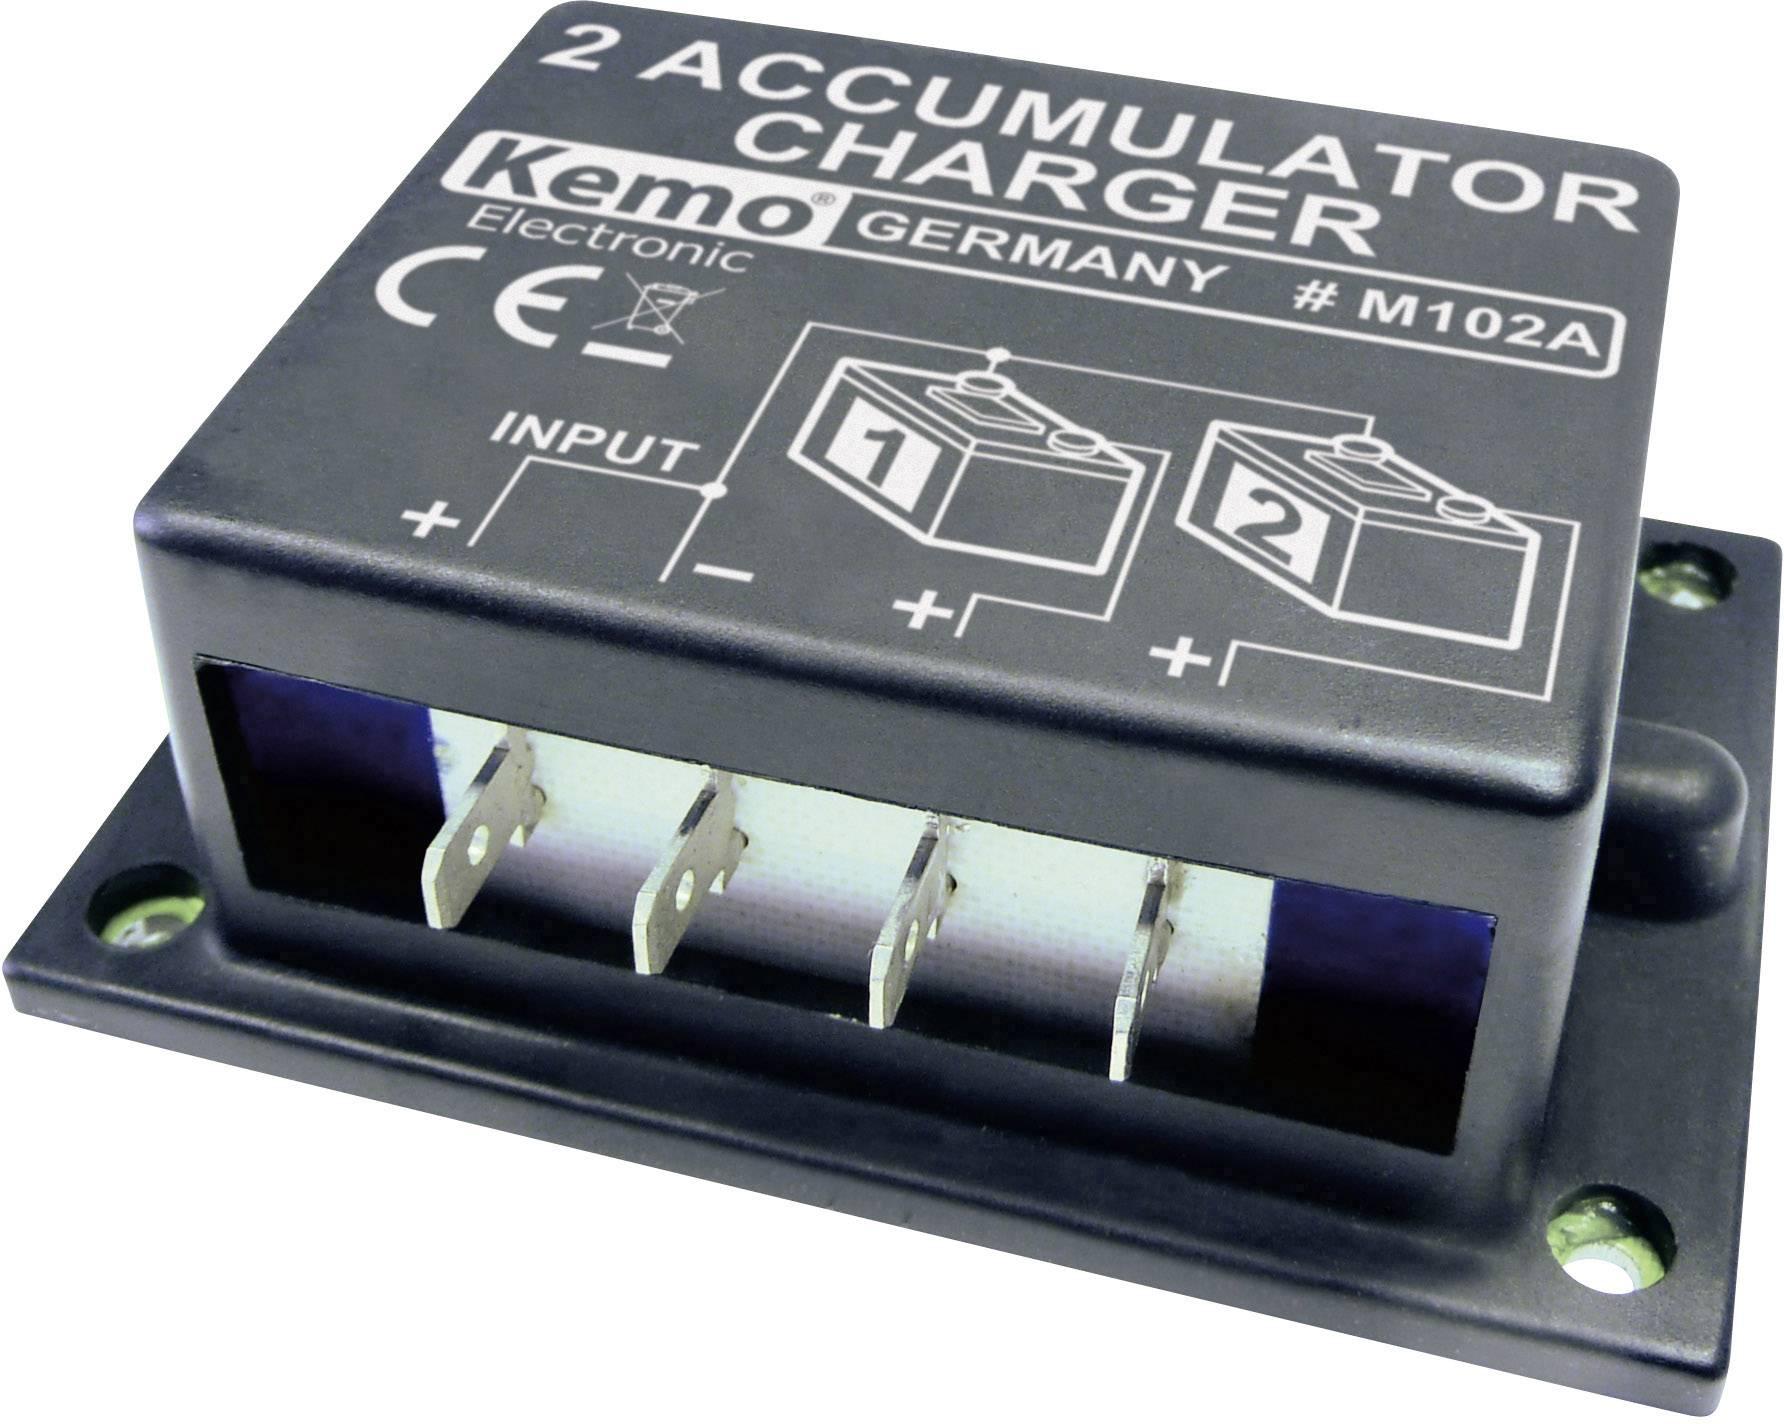 Nabíječka 2 akumulátorů Kemo M102N, 87 x 60 x 33 mm